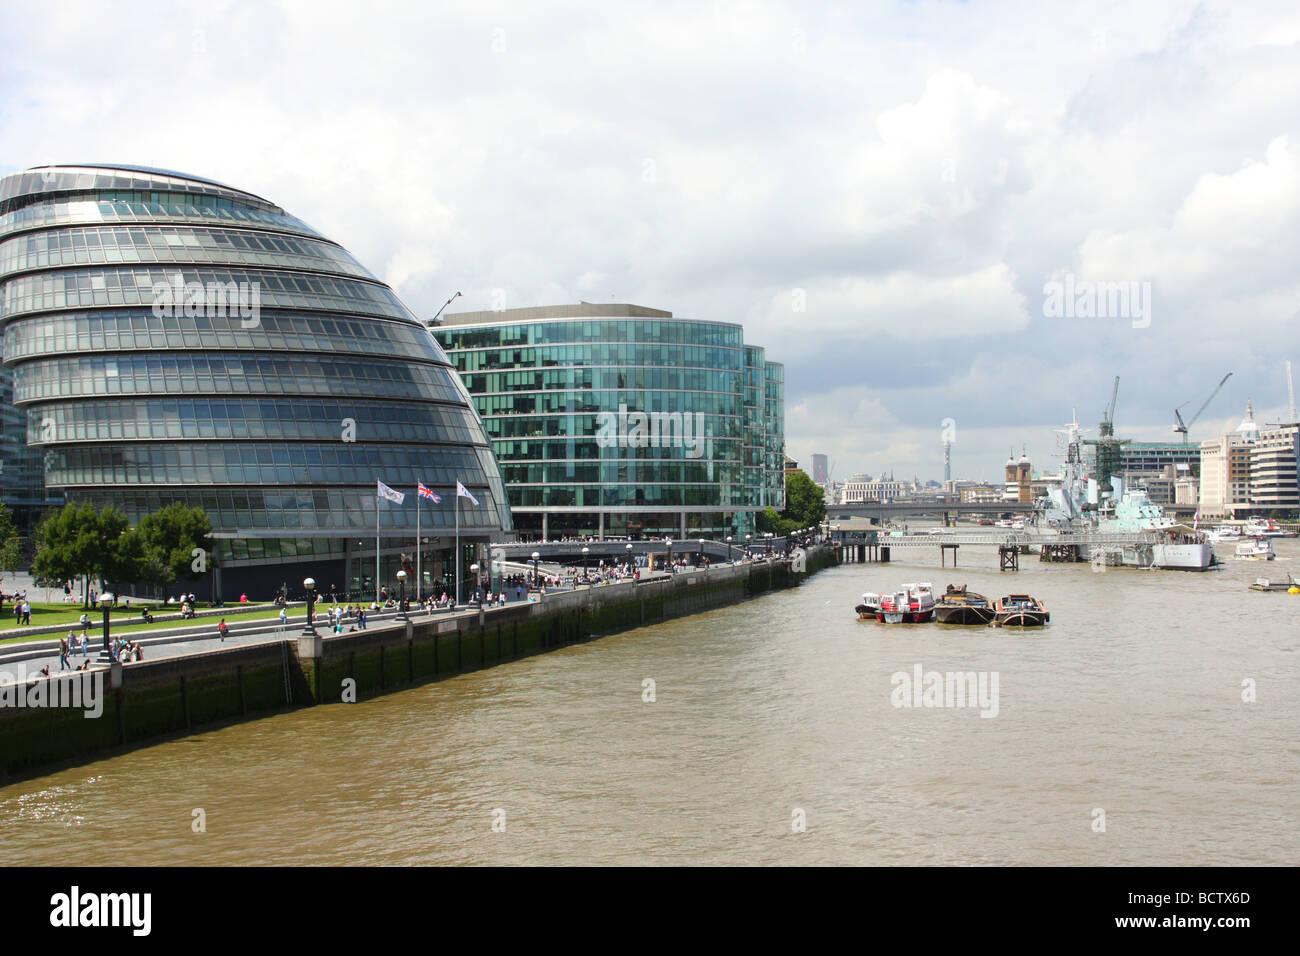 The Office of the Mayor of London & London Assembly. City Hall, London, England, U.K. - Stock Image